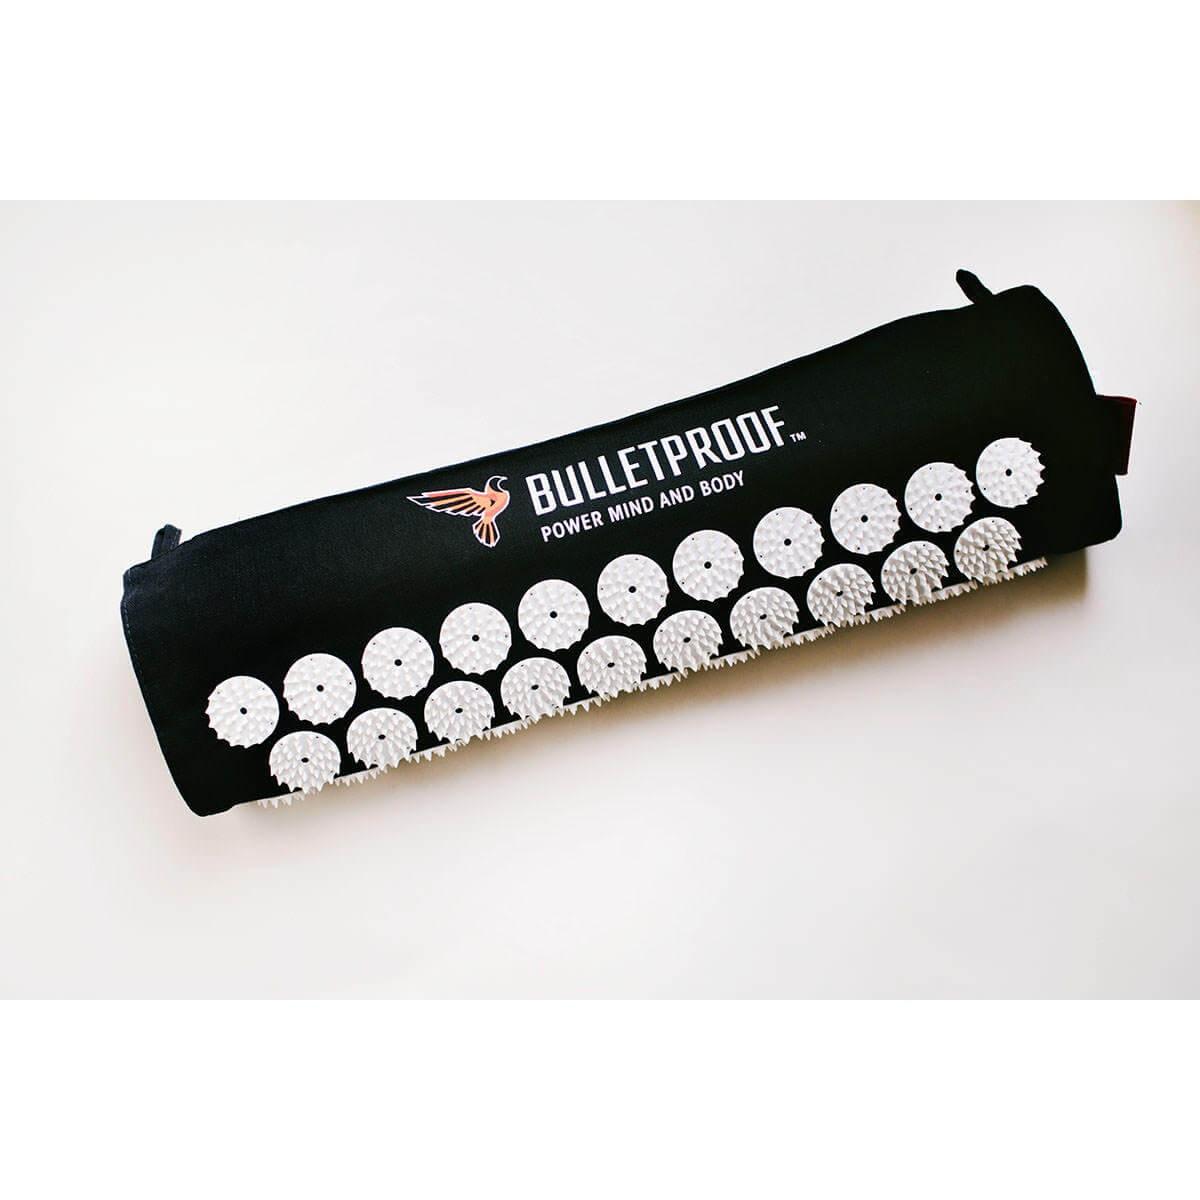 Sleep Induction Mat by Bulletproof